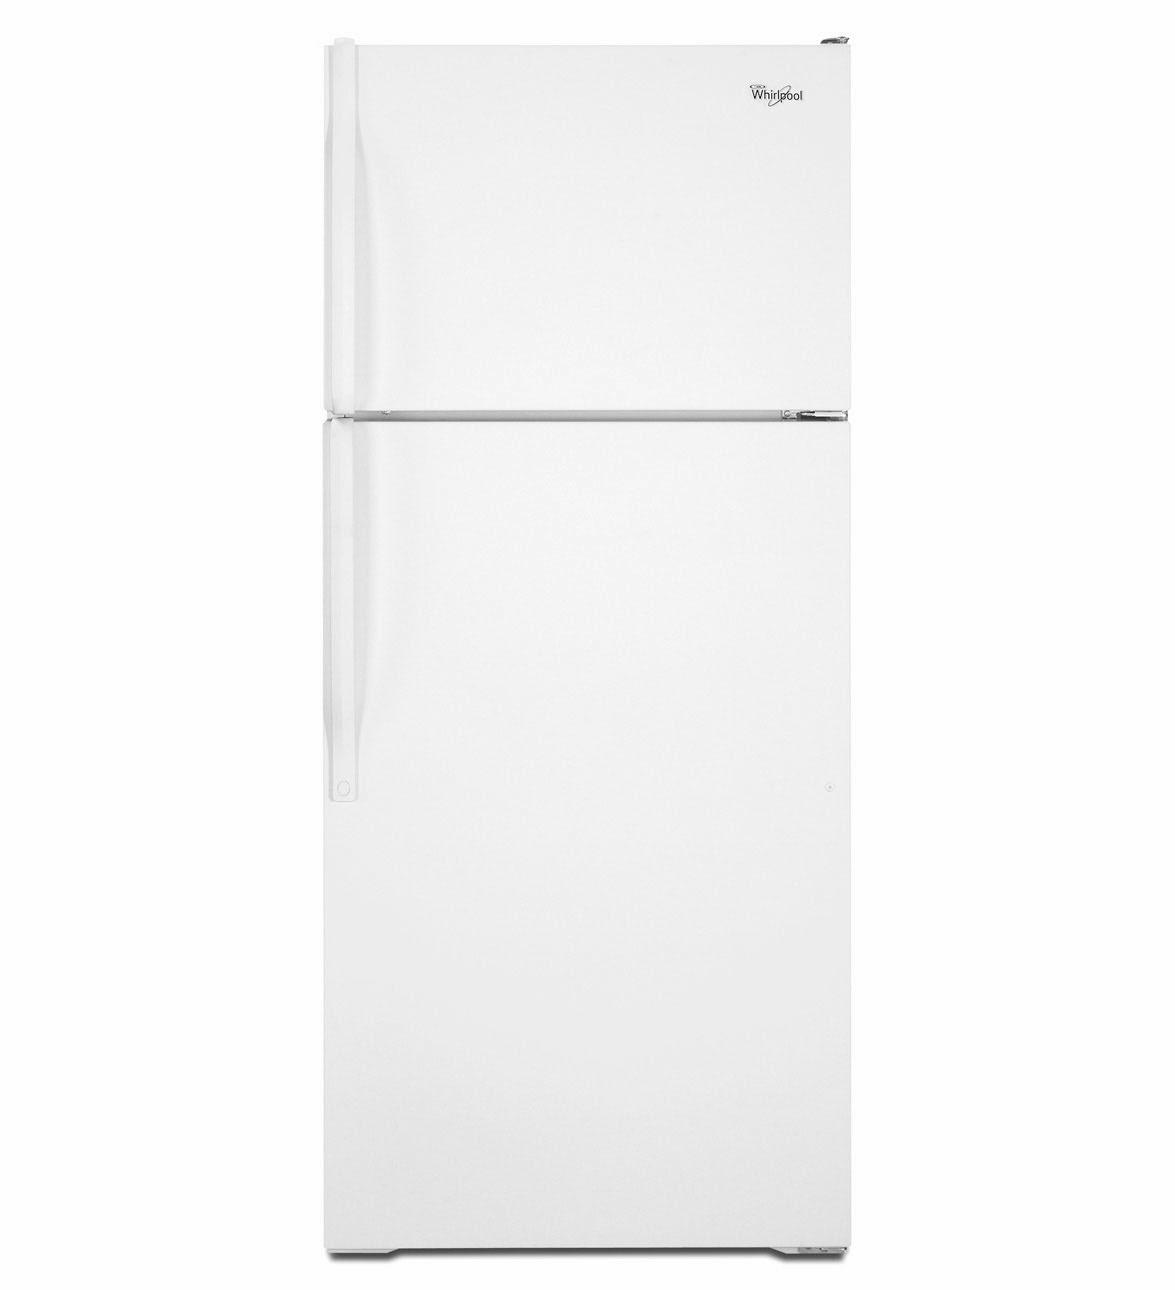 Whirlpool Refrigerator Brand White Top Freezer Whirlpool